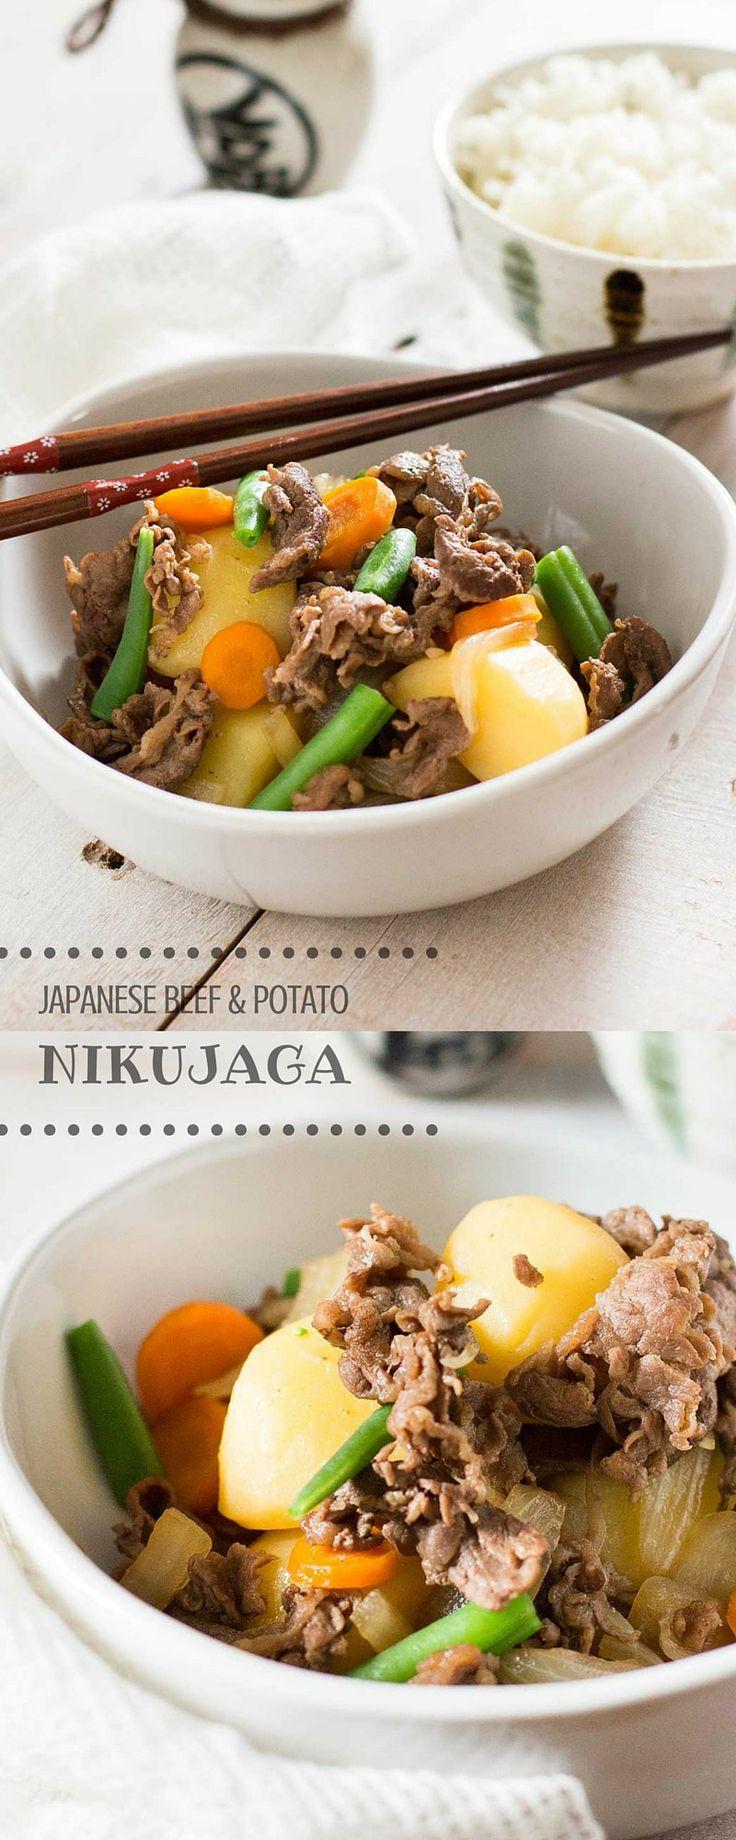 Nikujaga - Japanese Beef and Potatoes